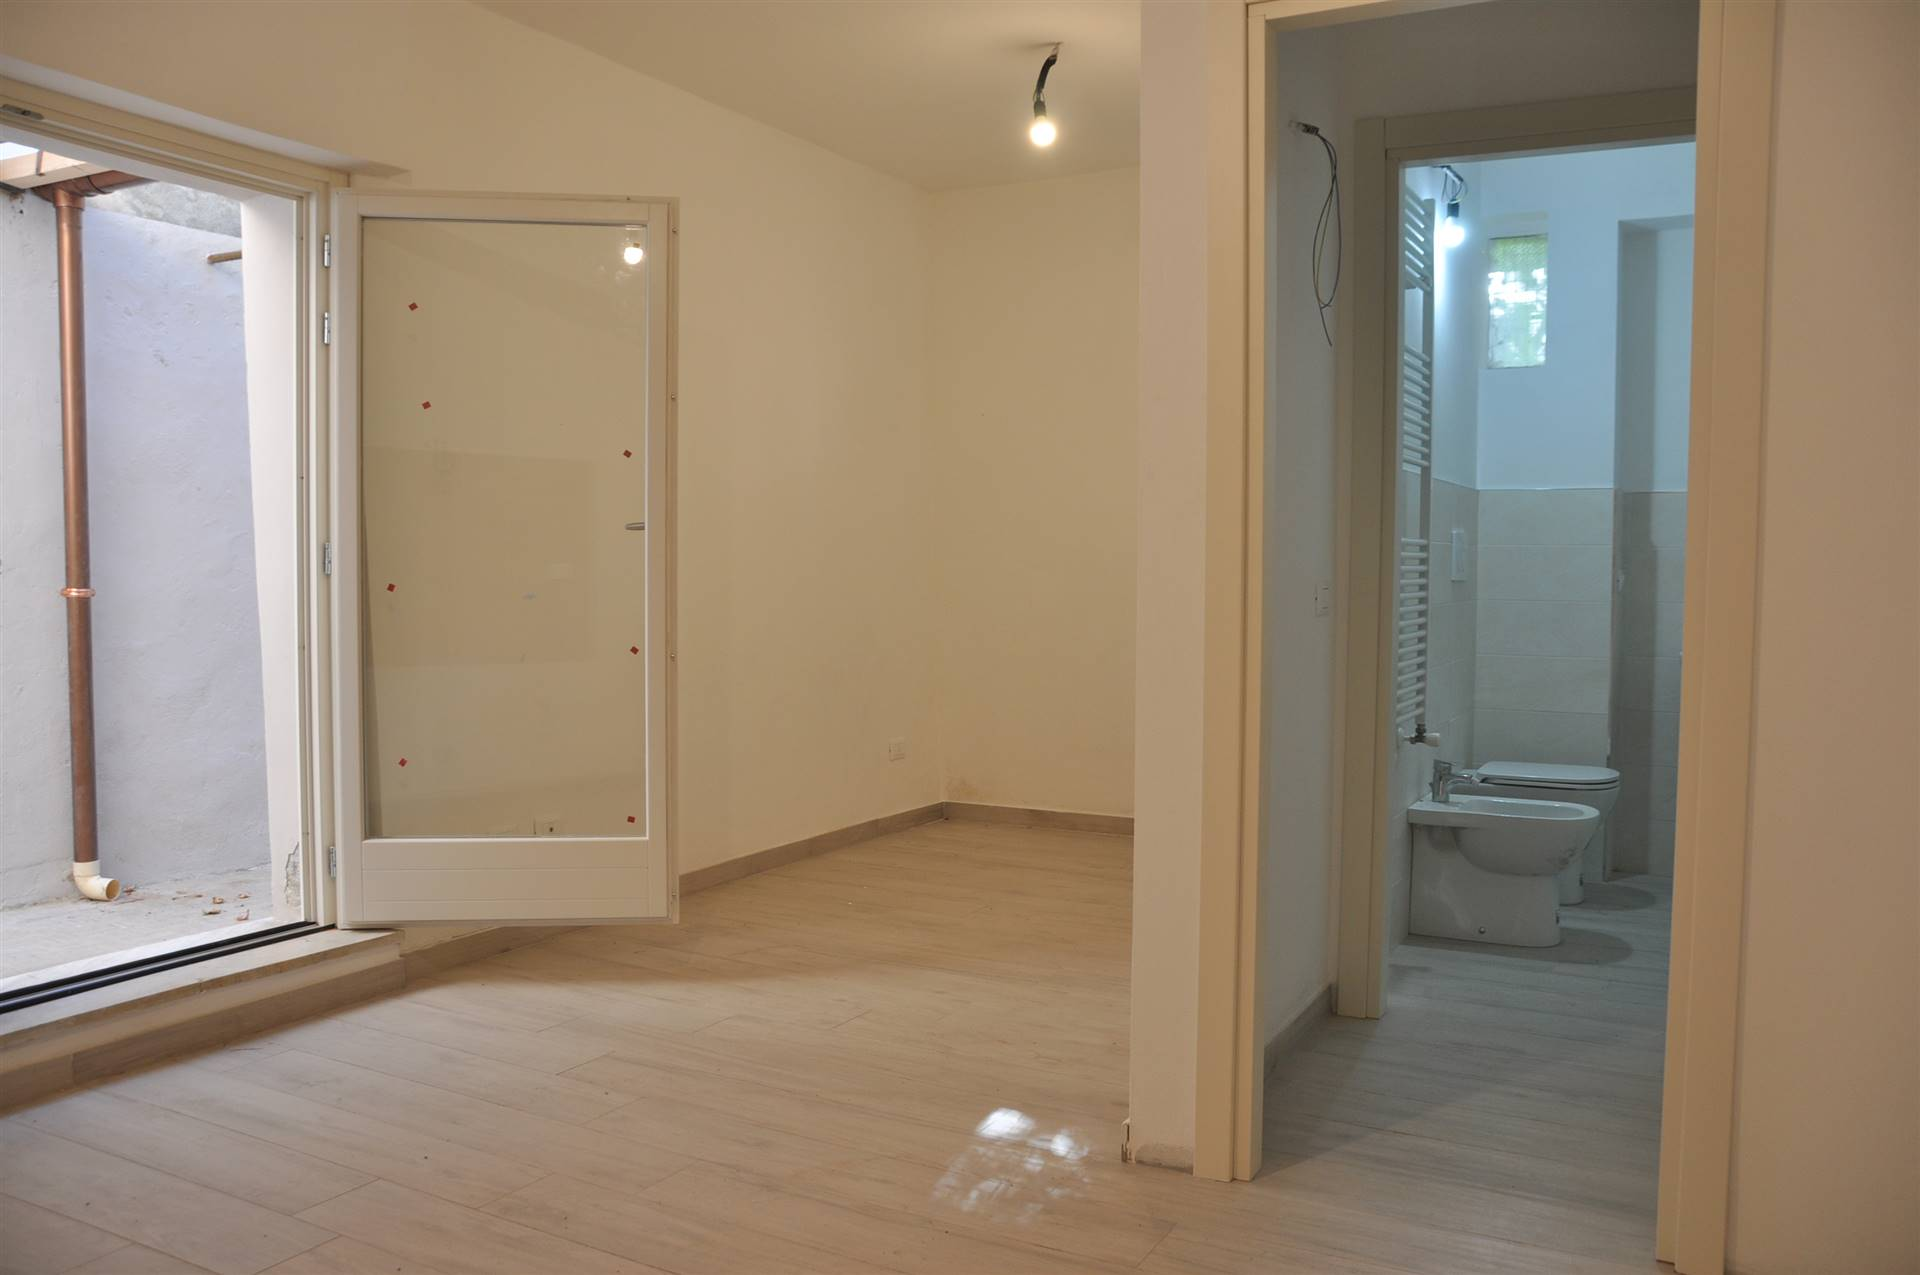 sala pranzo- ingresso bagno